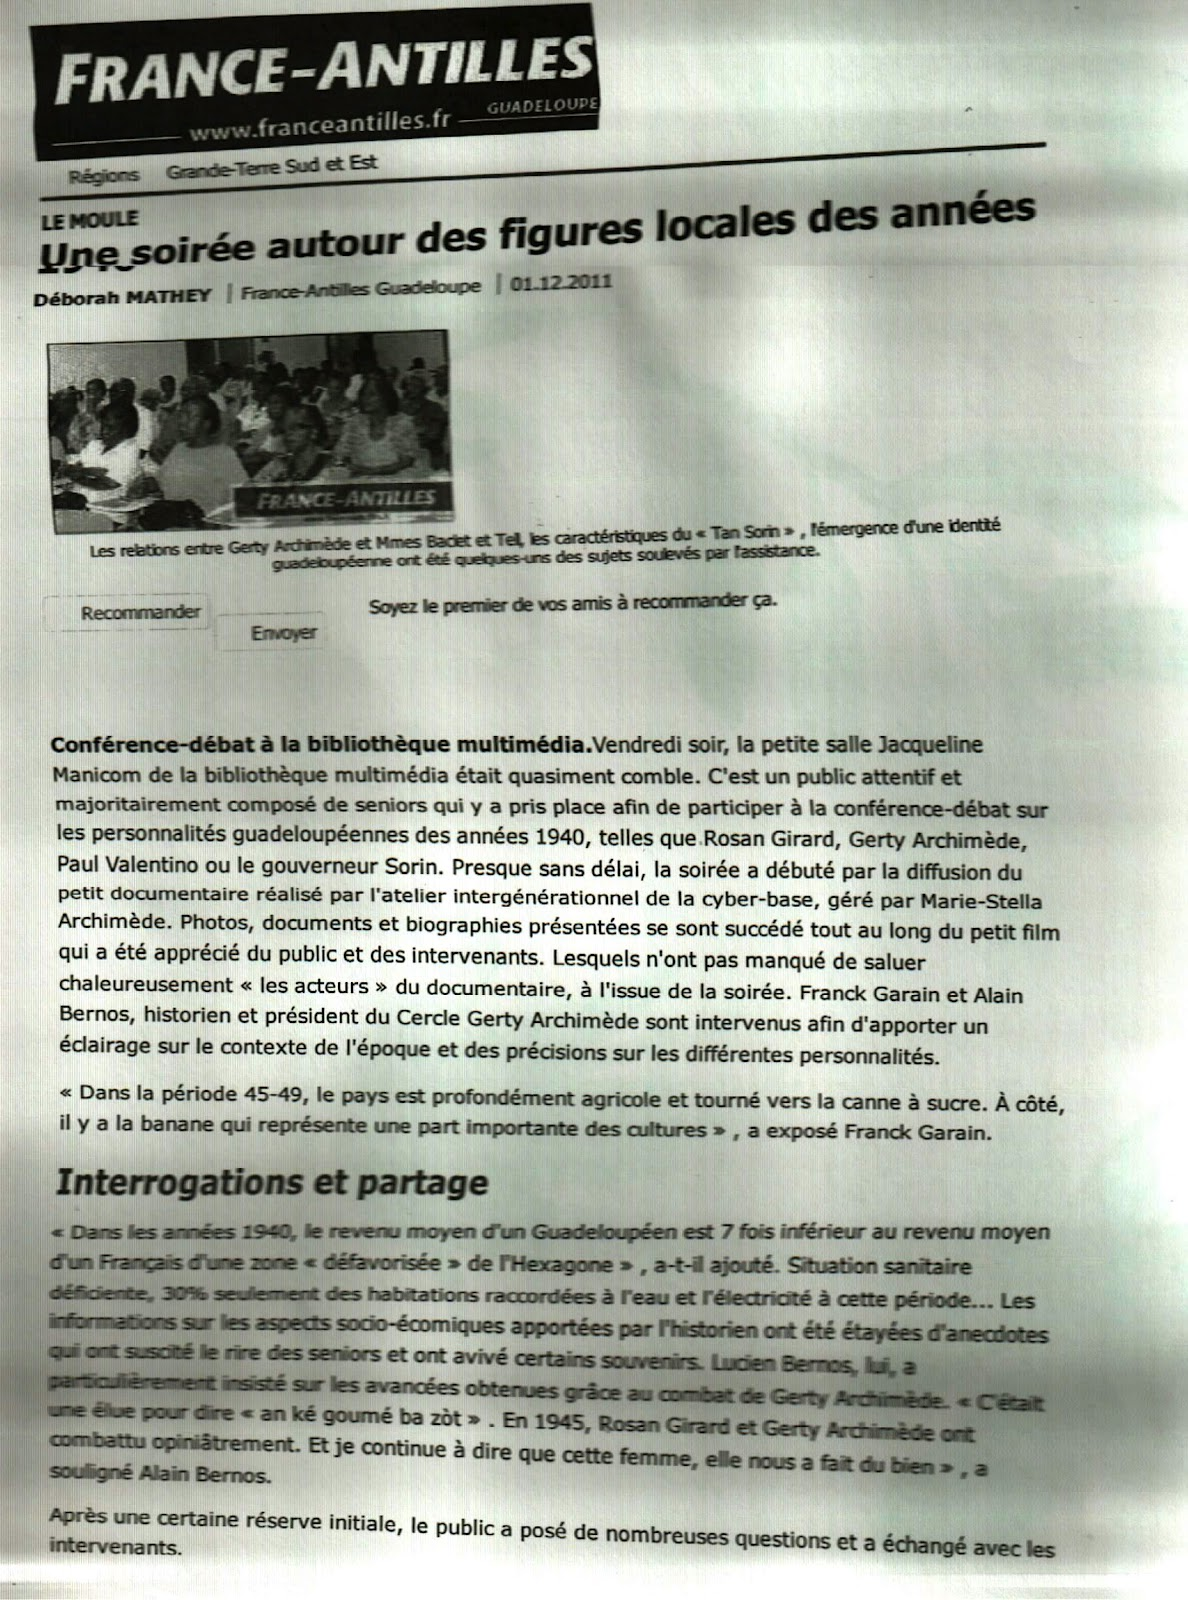 rencontre cyber base 2012 Aulnay-sous-Bois